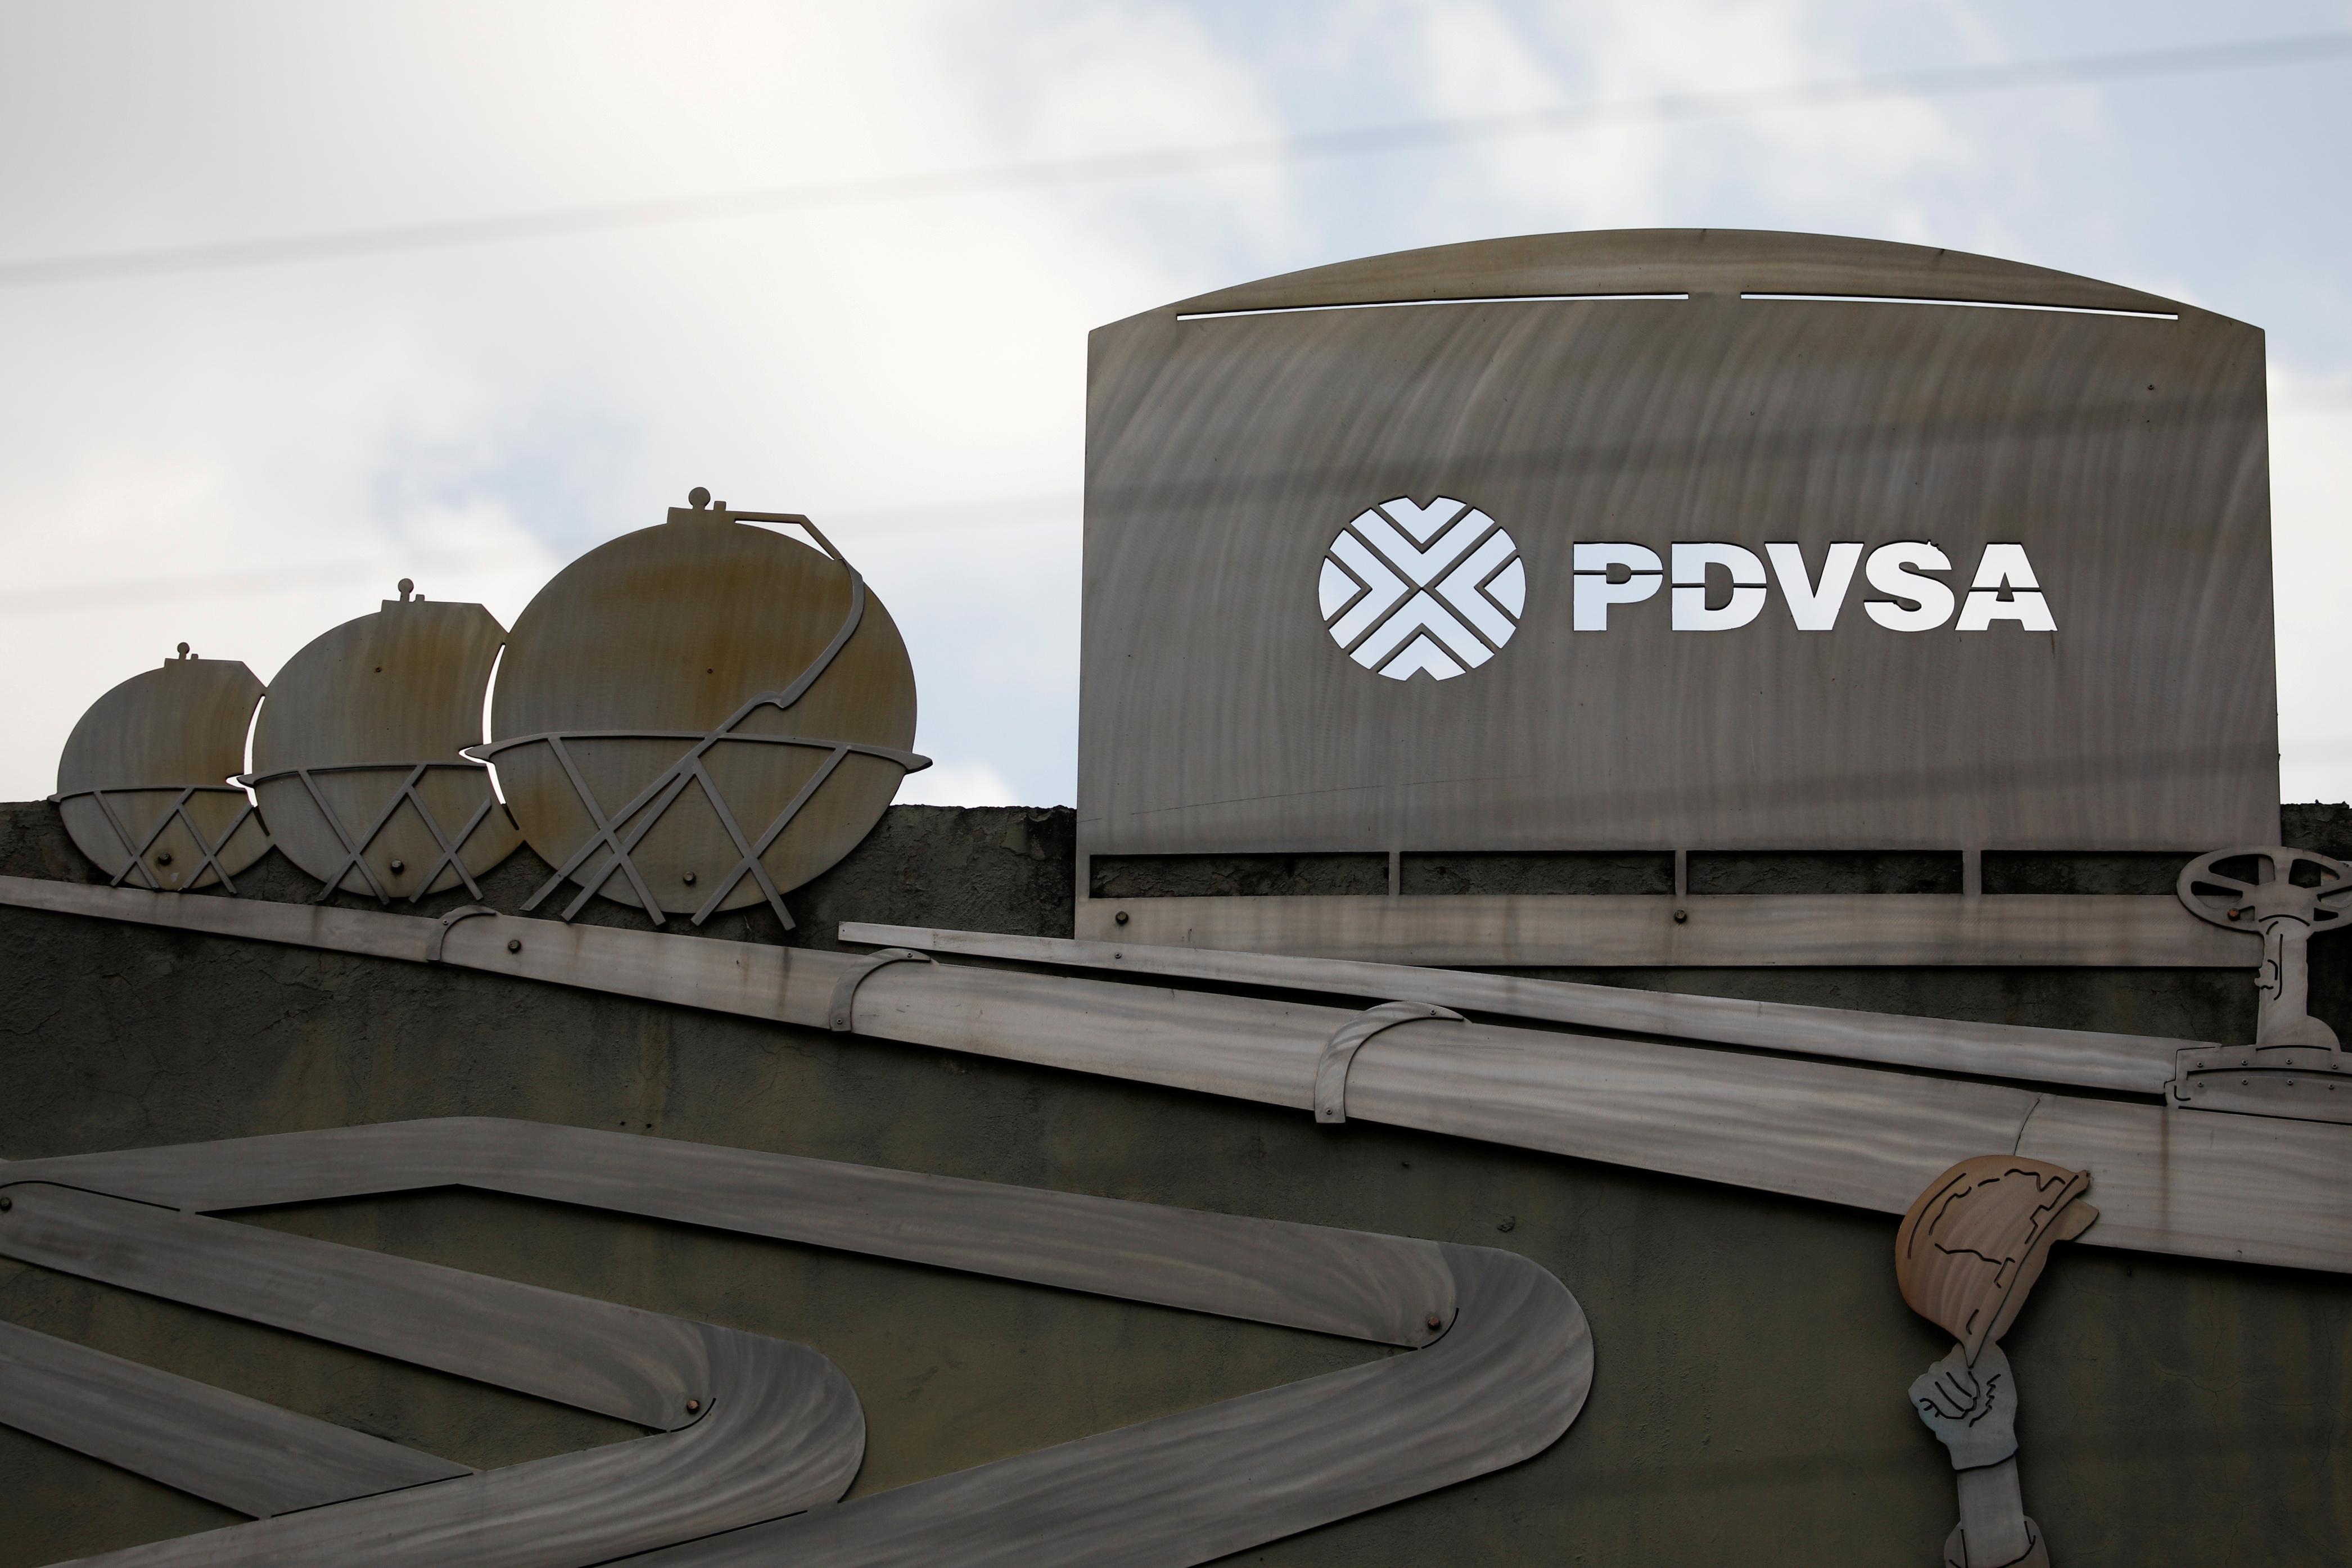 Venezuela slows oil output, blending as stocks mount: sources, data